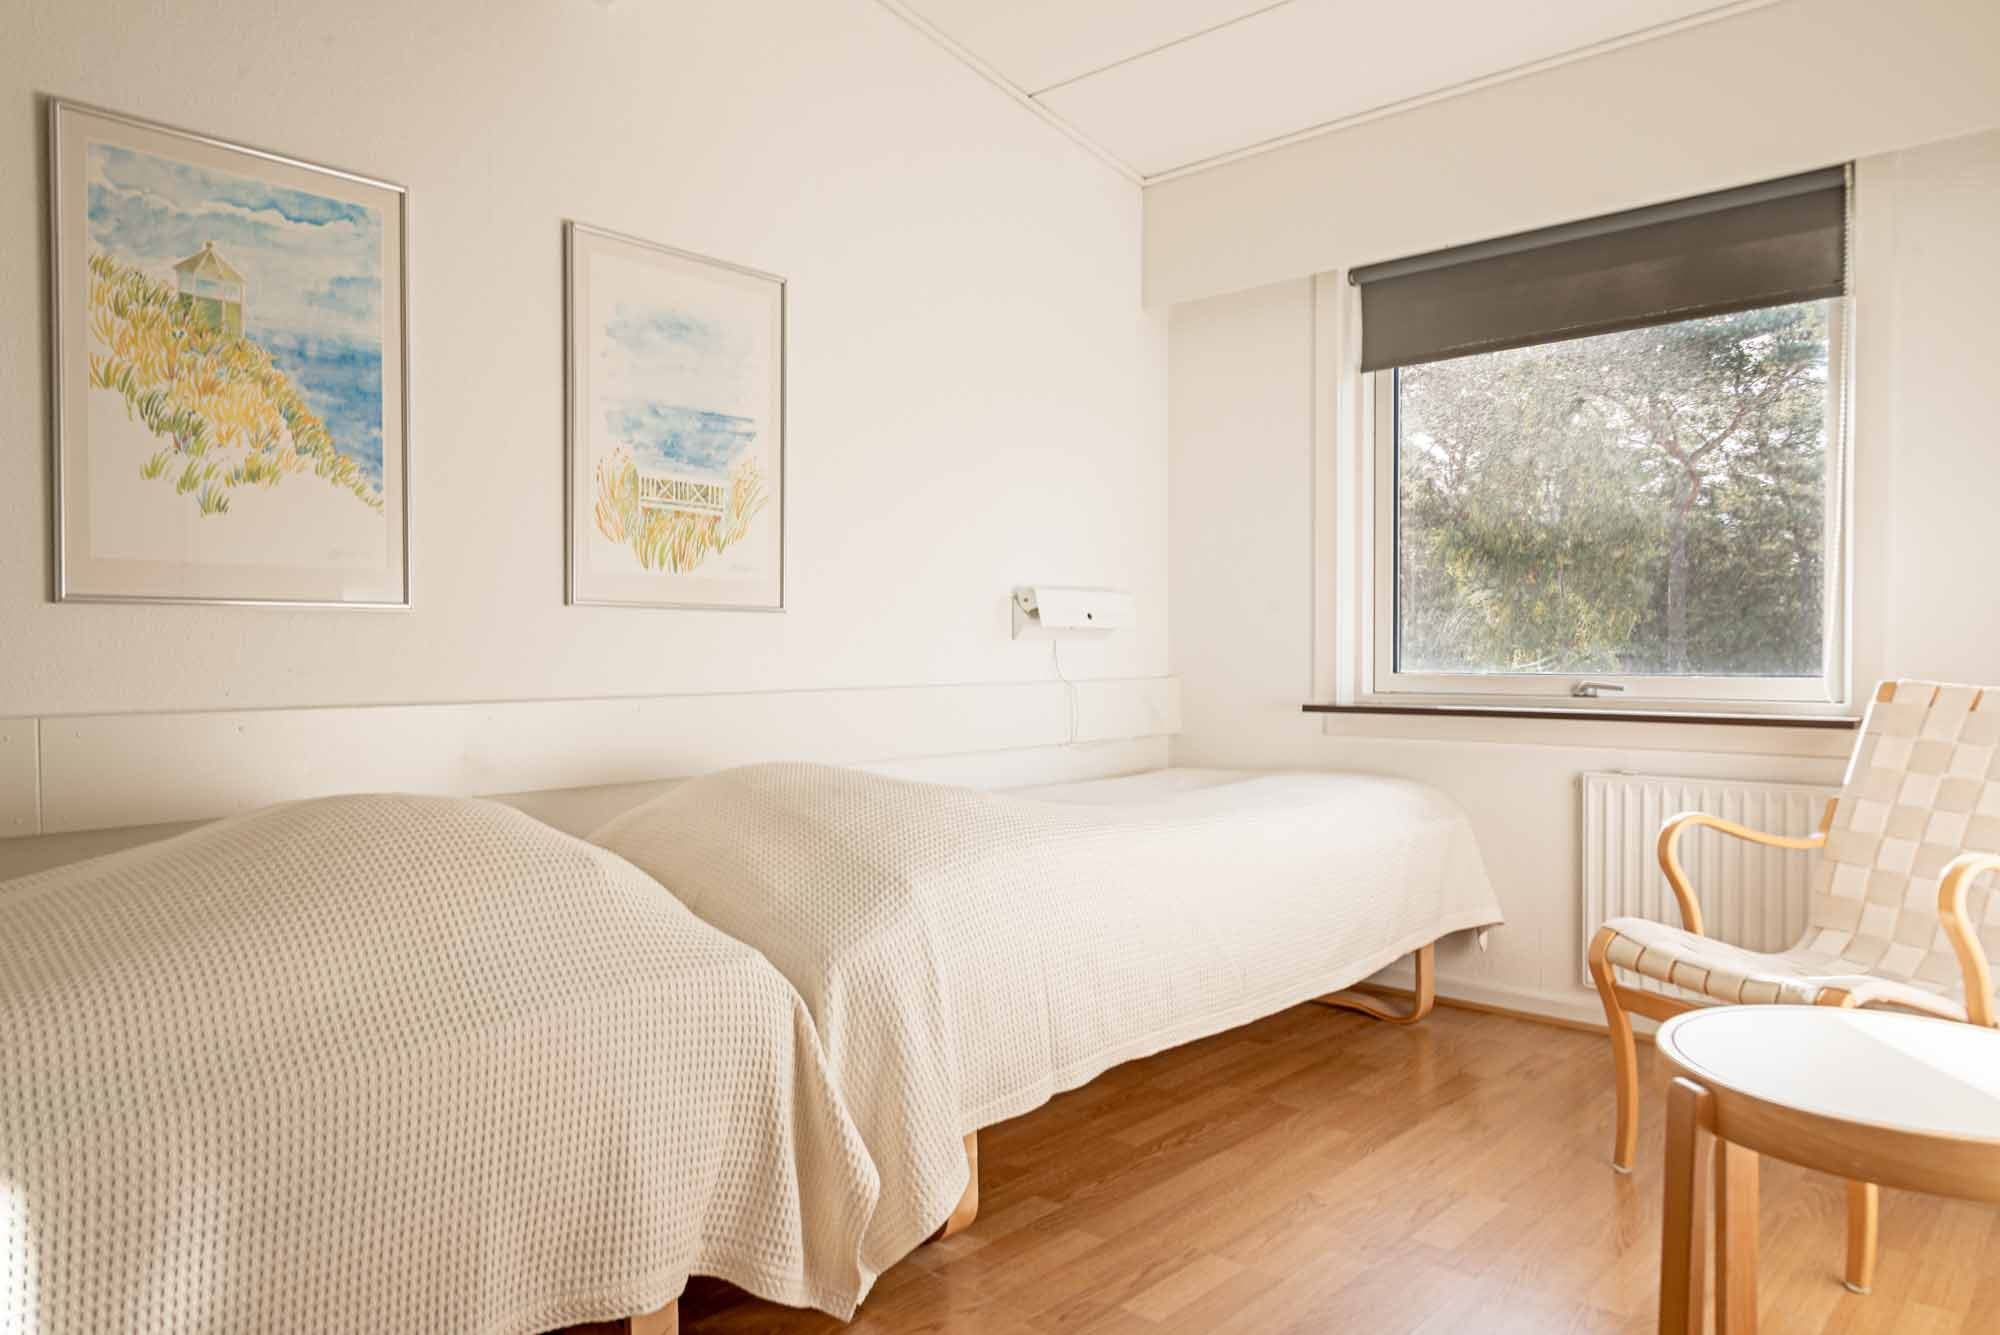 Dueodde Badehotel - Apartments